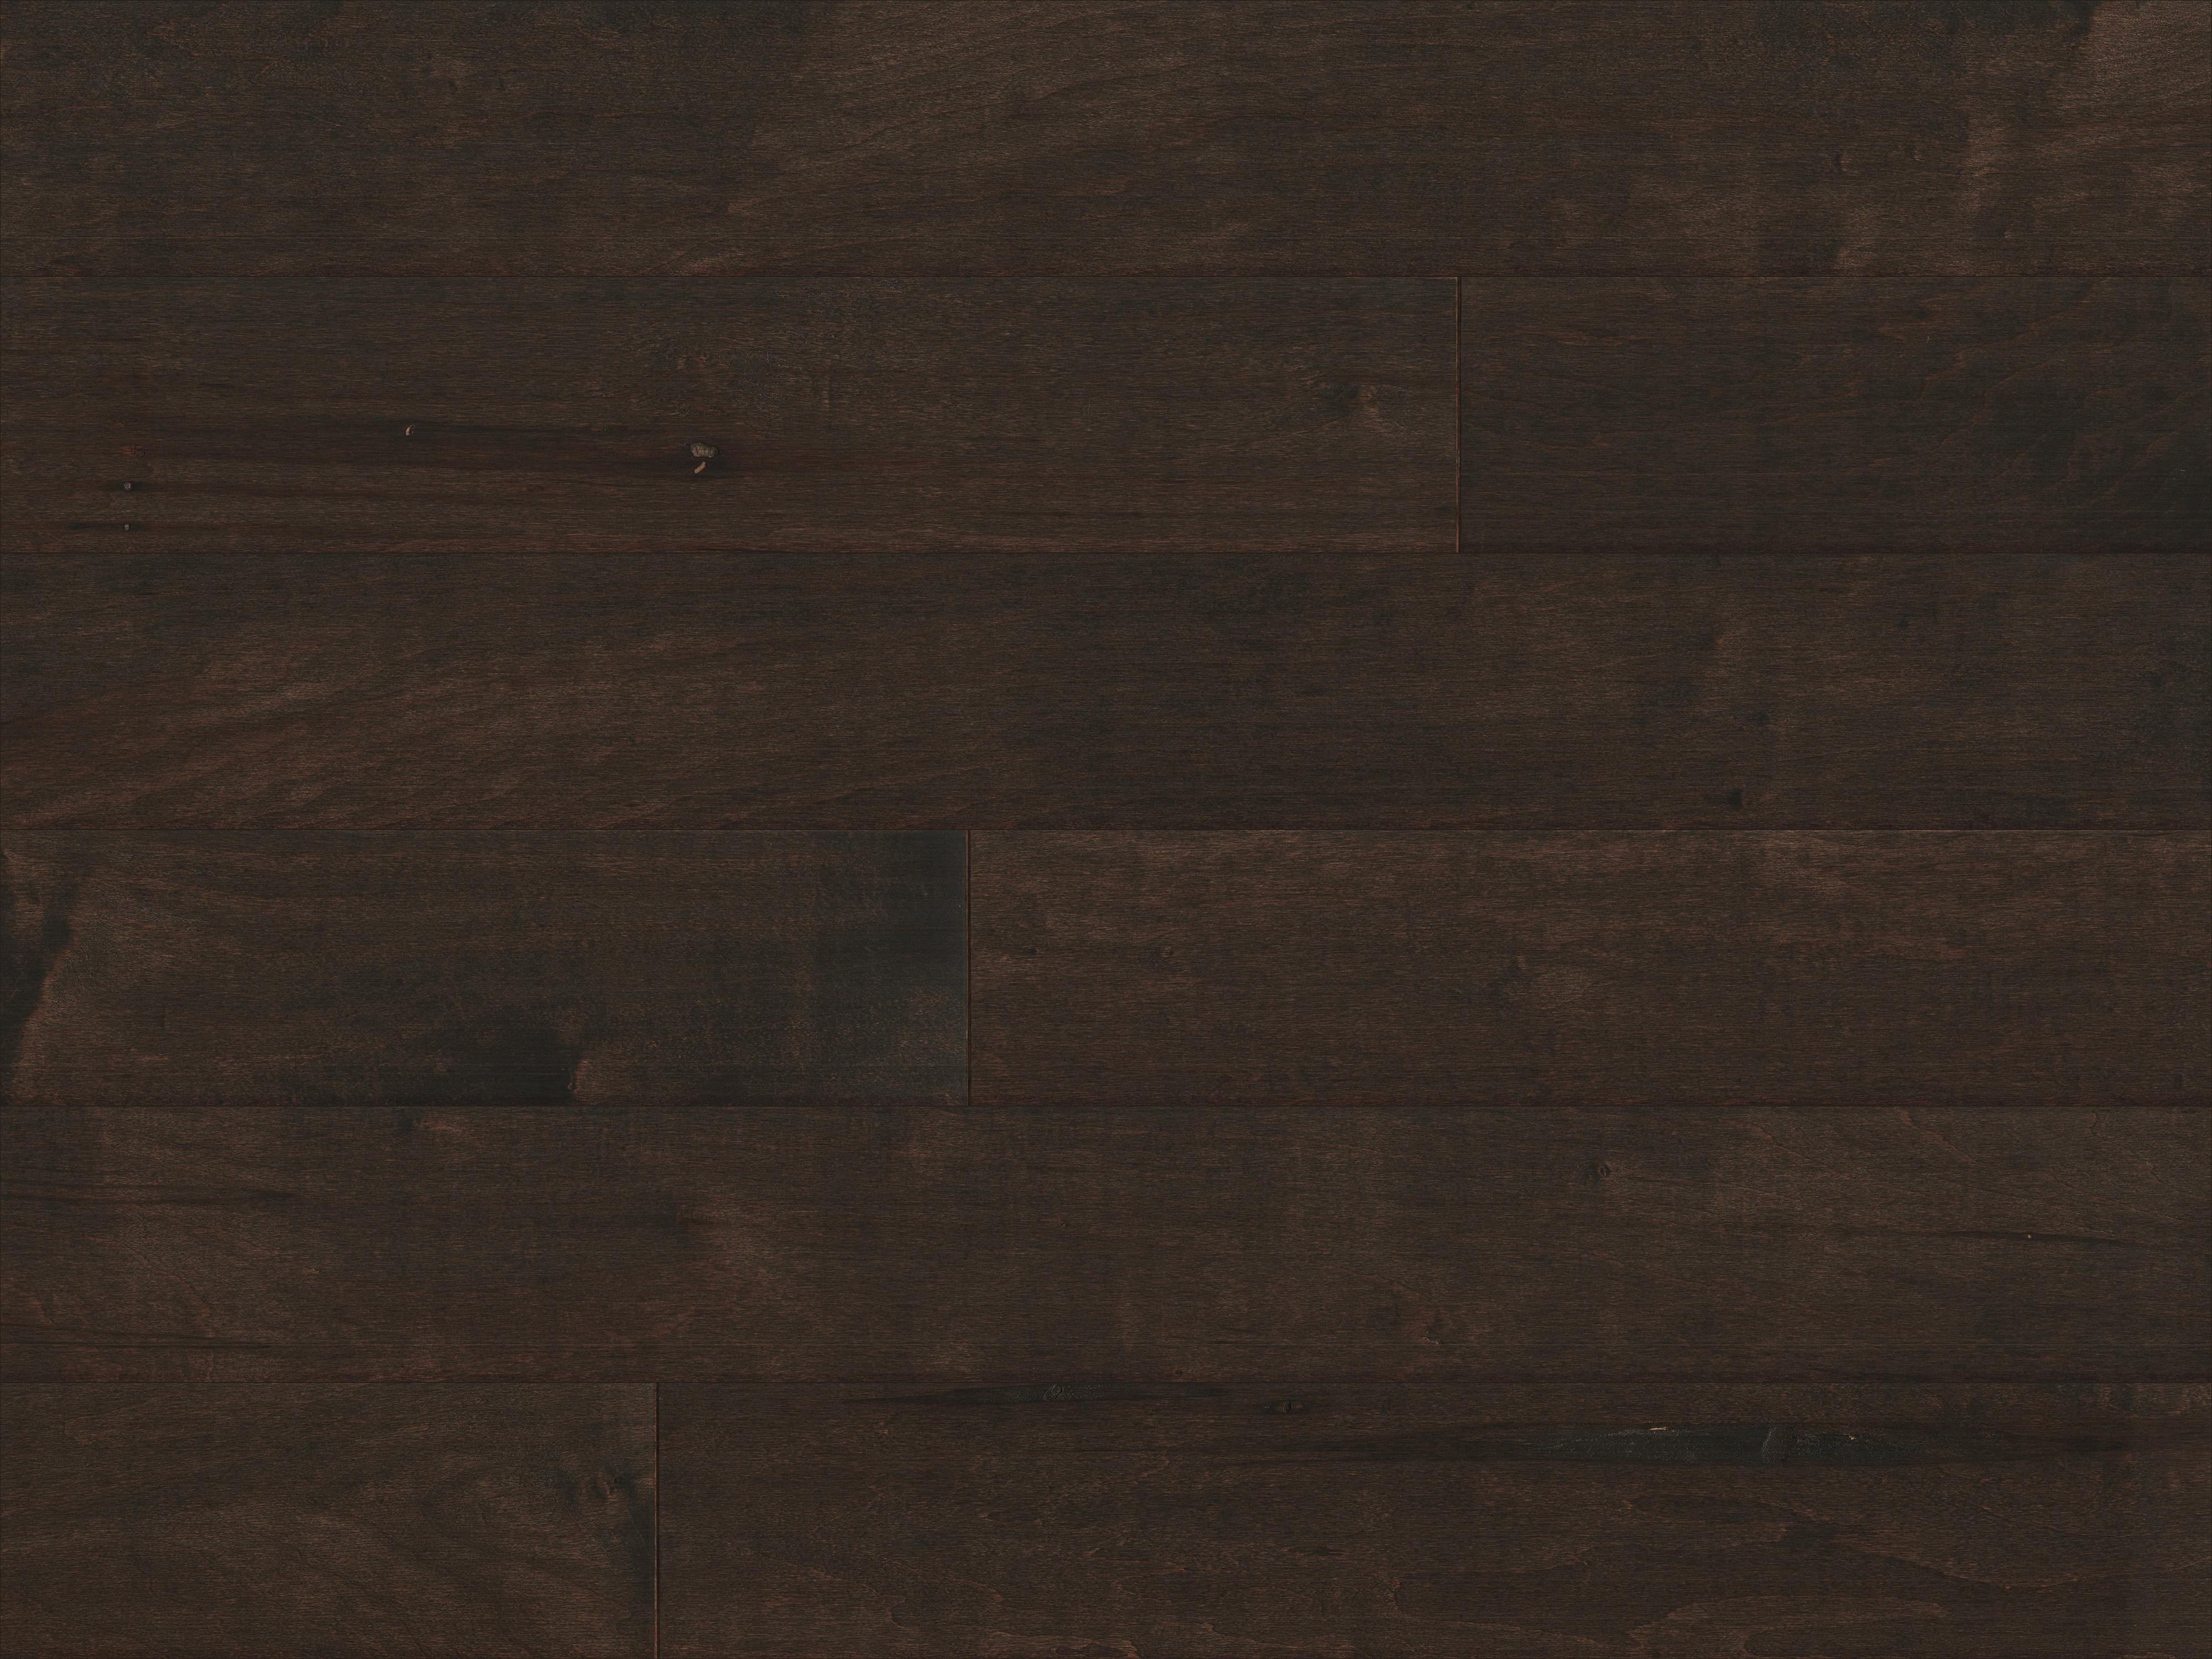 2 1 4 engineered hardwood flooring of mullican ridgecrest maple cappuccino 1 2 thick 5 wide engineered with regard to mullican ridgecrest maple cappuccino 1 2 thick 5 wide engineered hardwood flooring